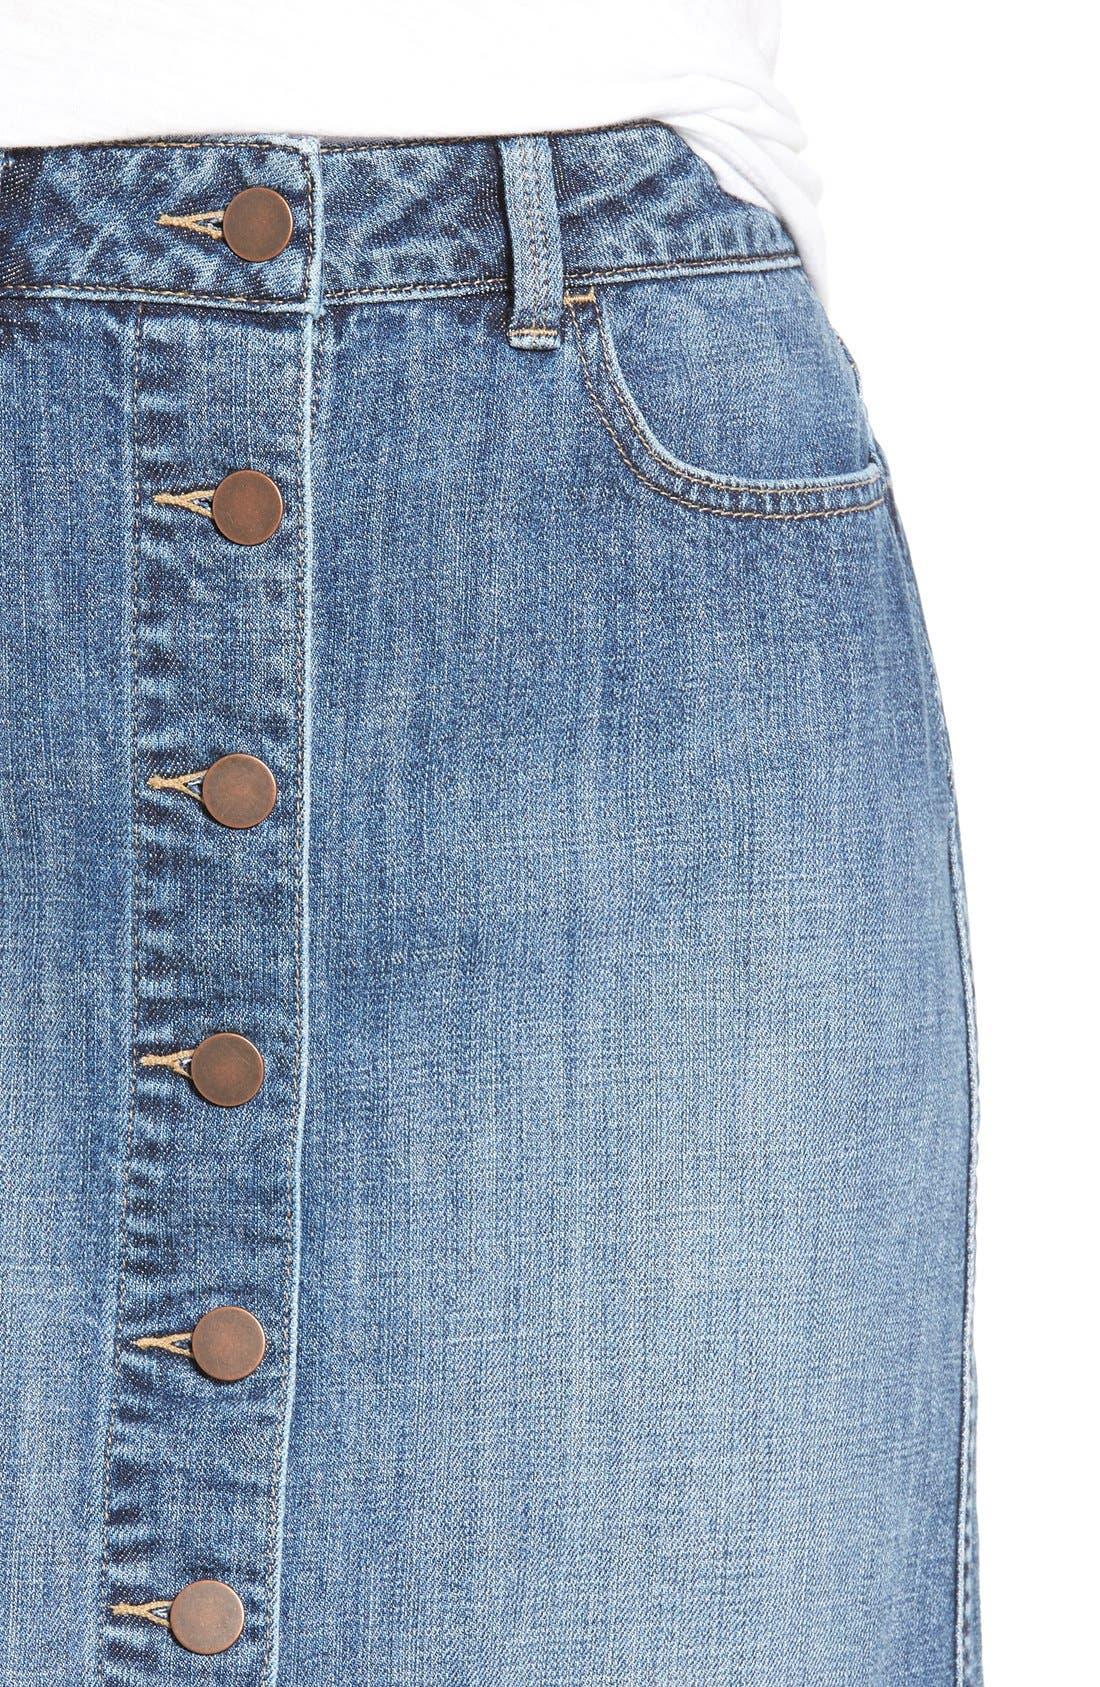 Button Front Denim Midi Skirt,                             Alternate thumbnail 4, color,                             Bluejay Medium Vintage